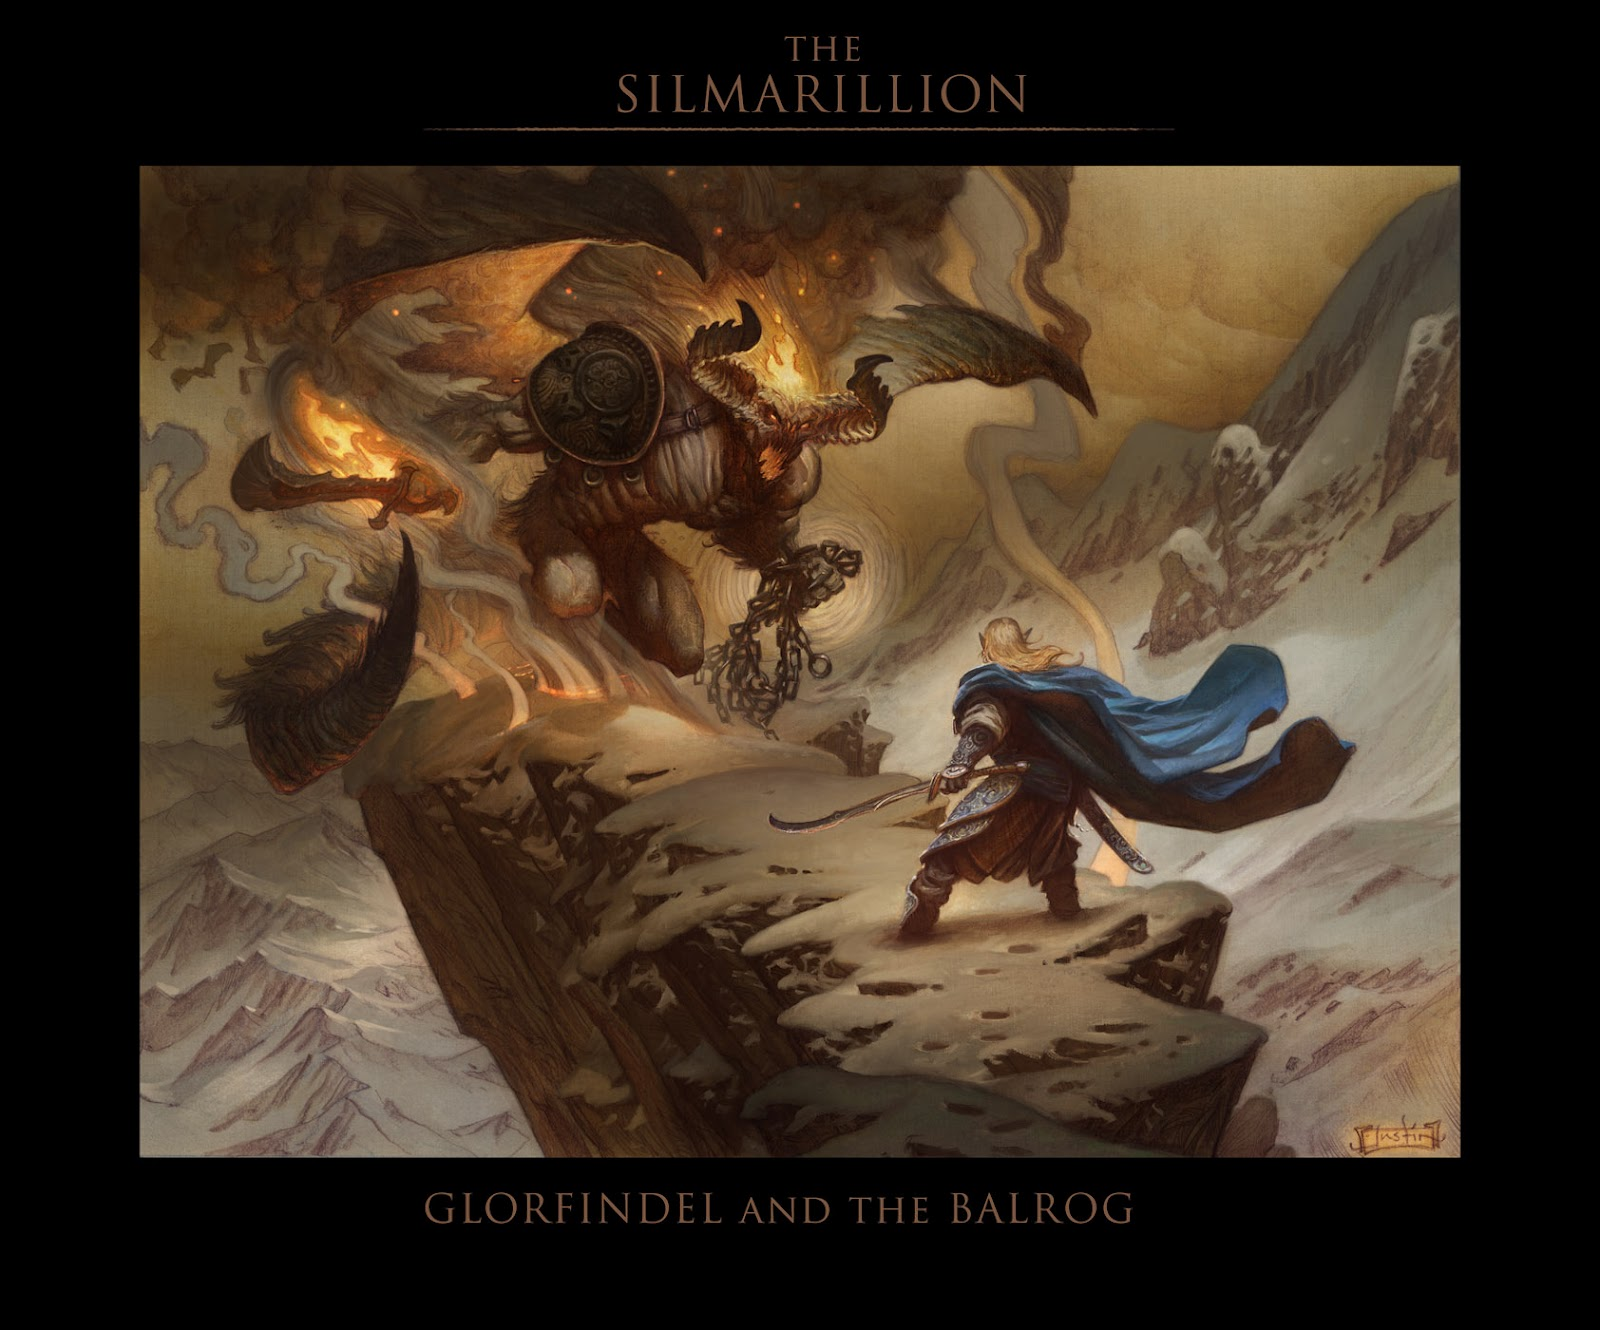 The Digital Silmarillion: Joining the Dark Side